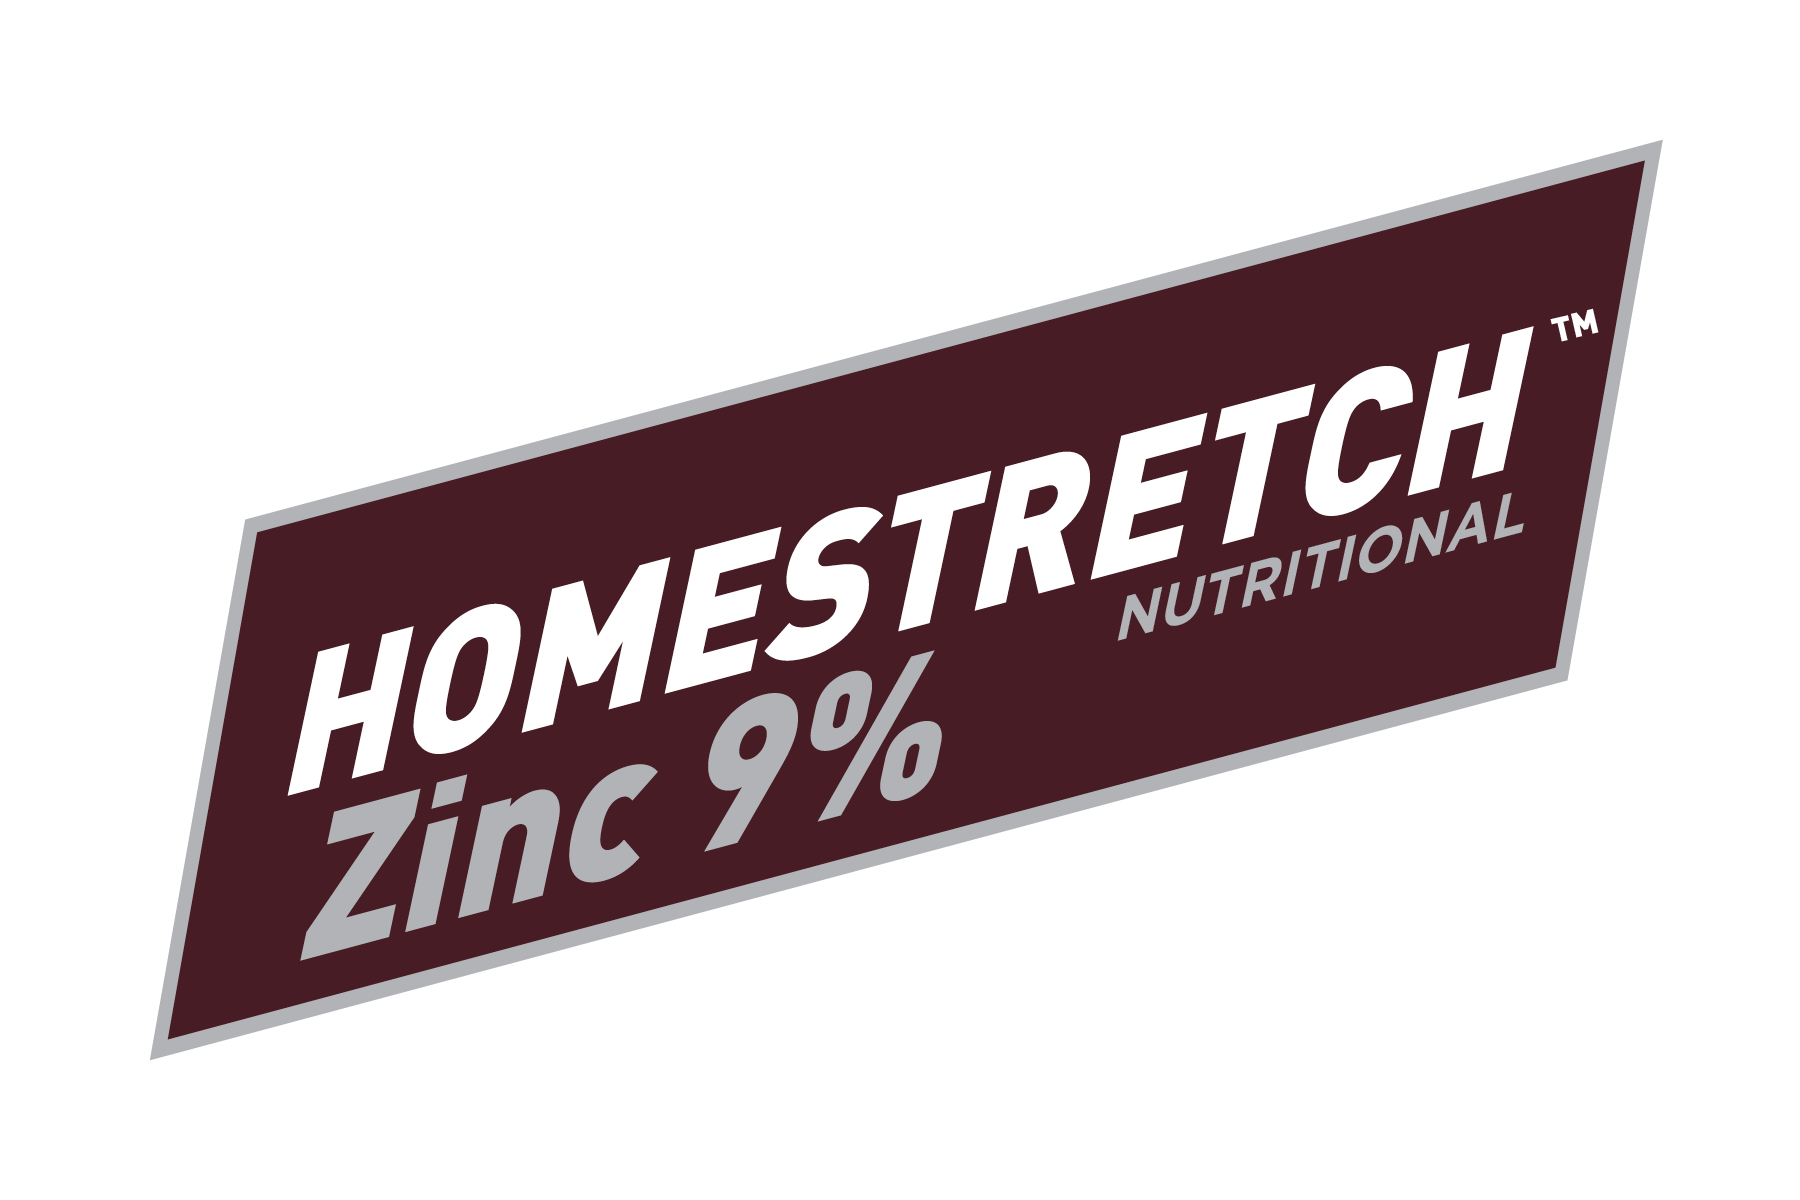 HOMESTRETCH™ Zinc 9%